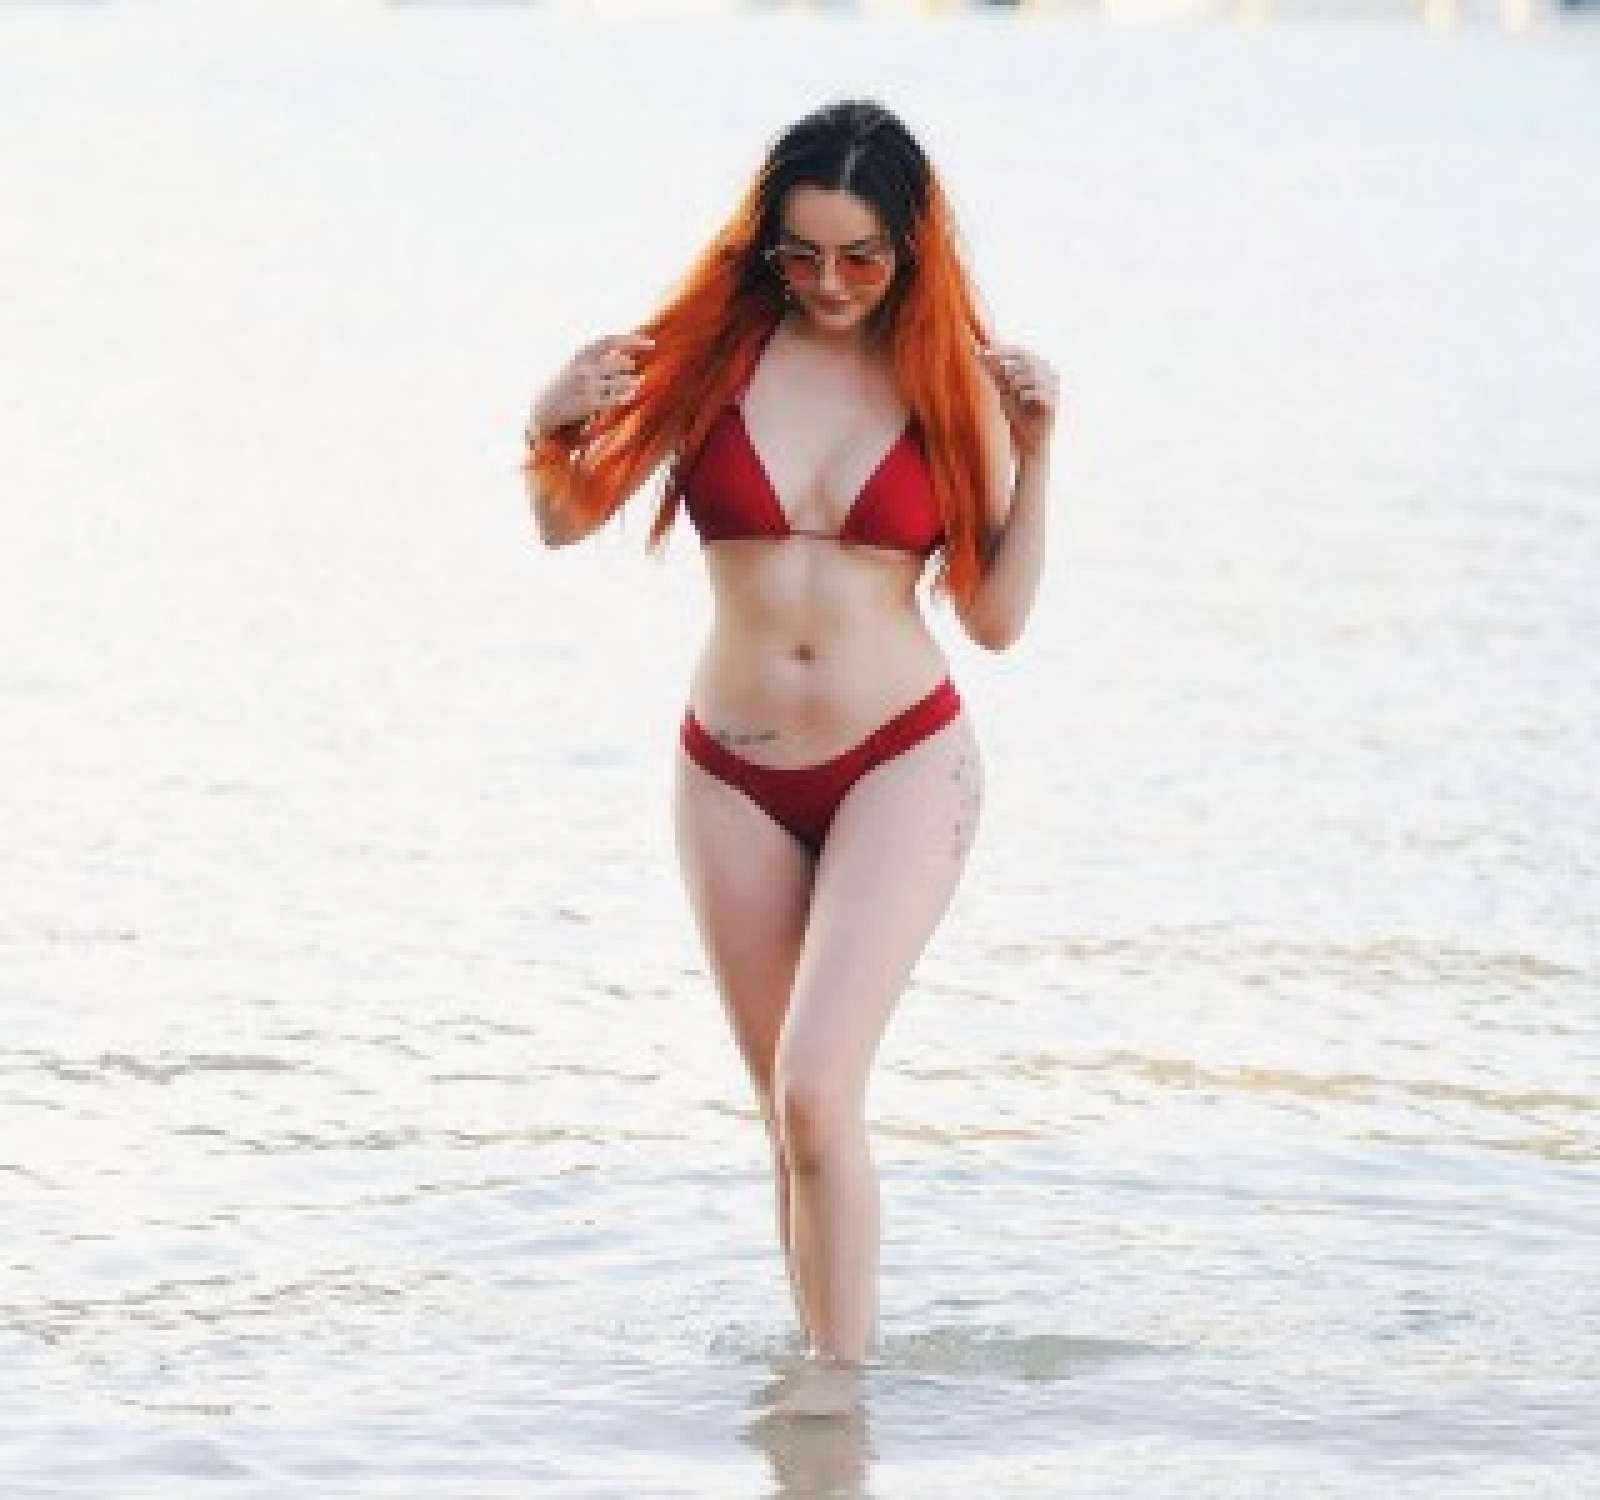 Sarah Goodhart in Red Bikini on the beach in Tenerife Pic 1 of 35